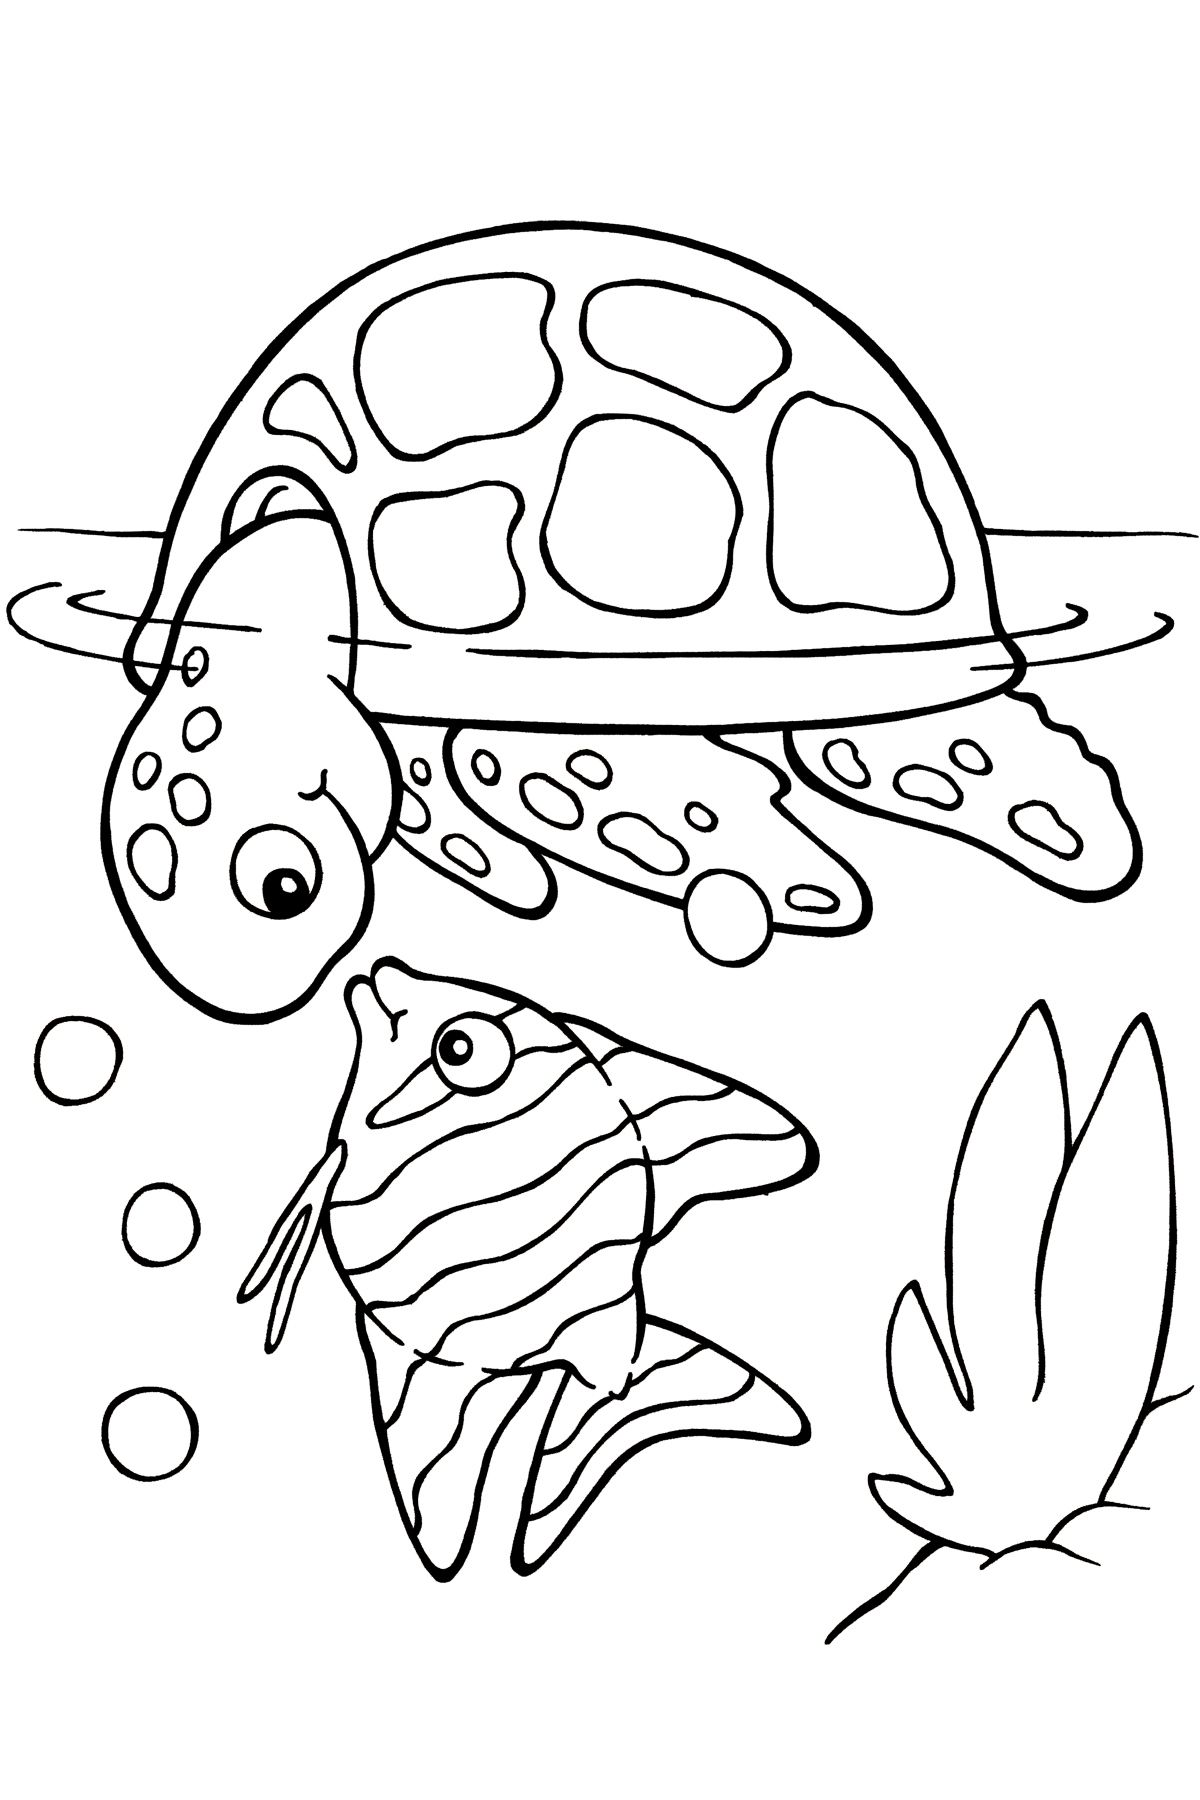 Image result for coloring pages fox | Les Tortugues de mar ...